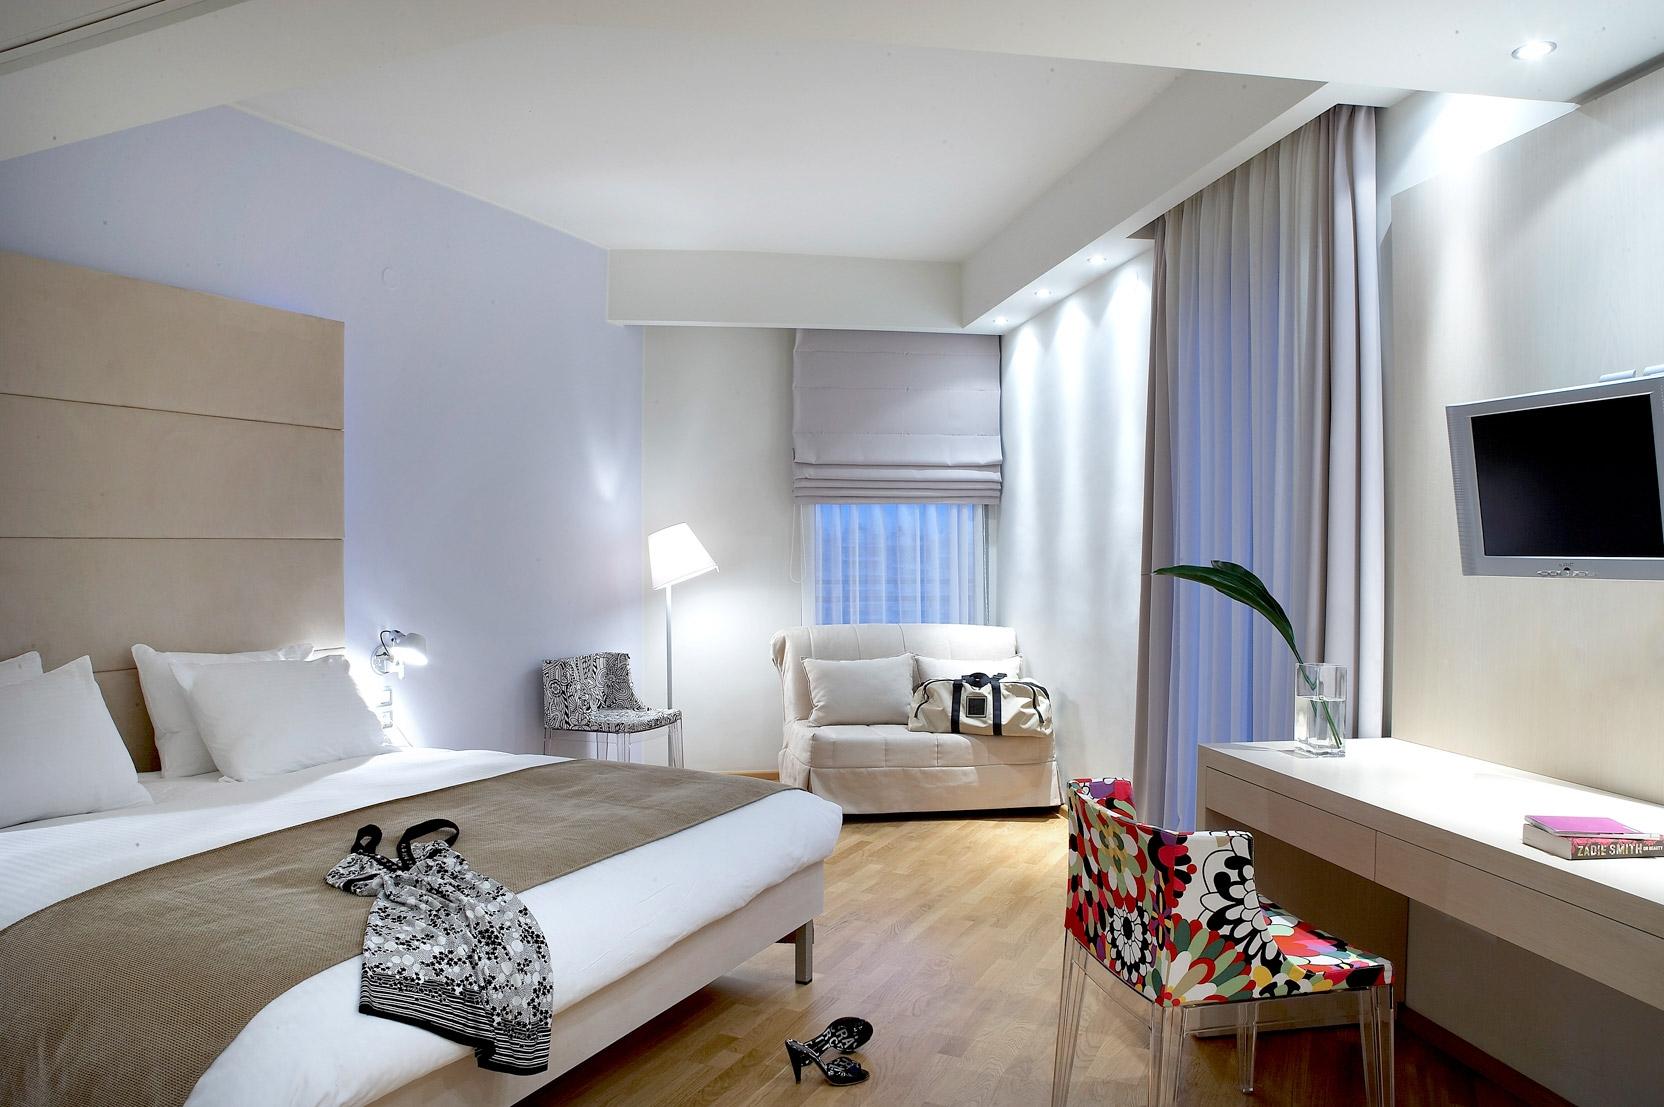 Olympia Hotel Thessaloniki - Θεσσαλονίκη ✦ 2 Ημέρες